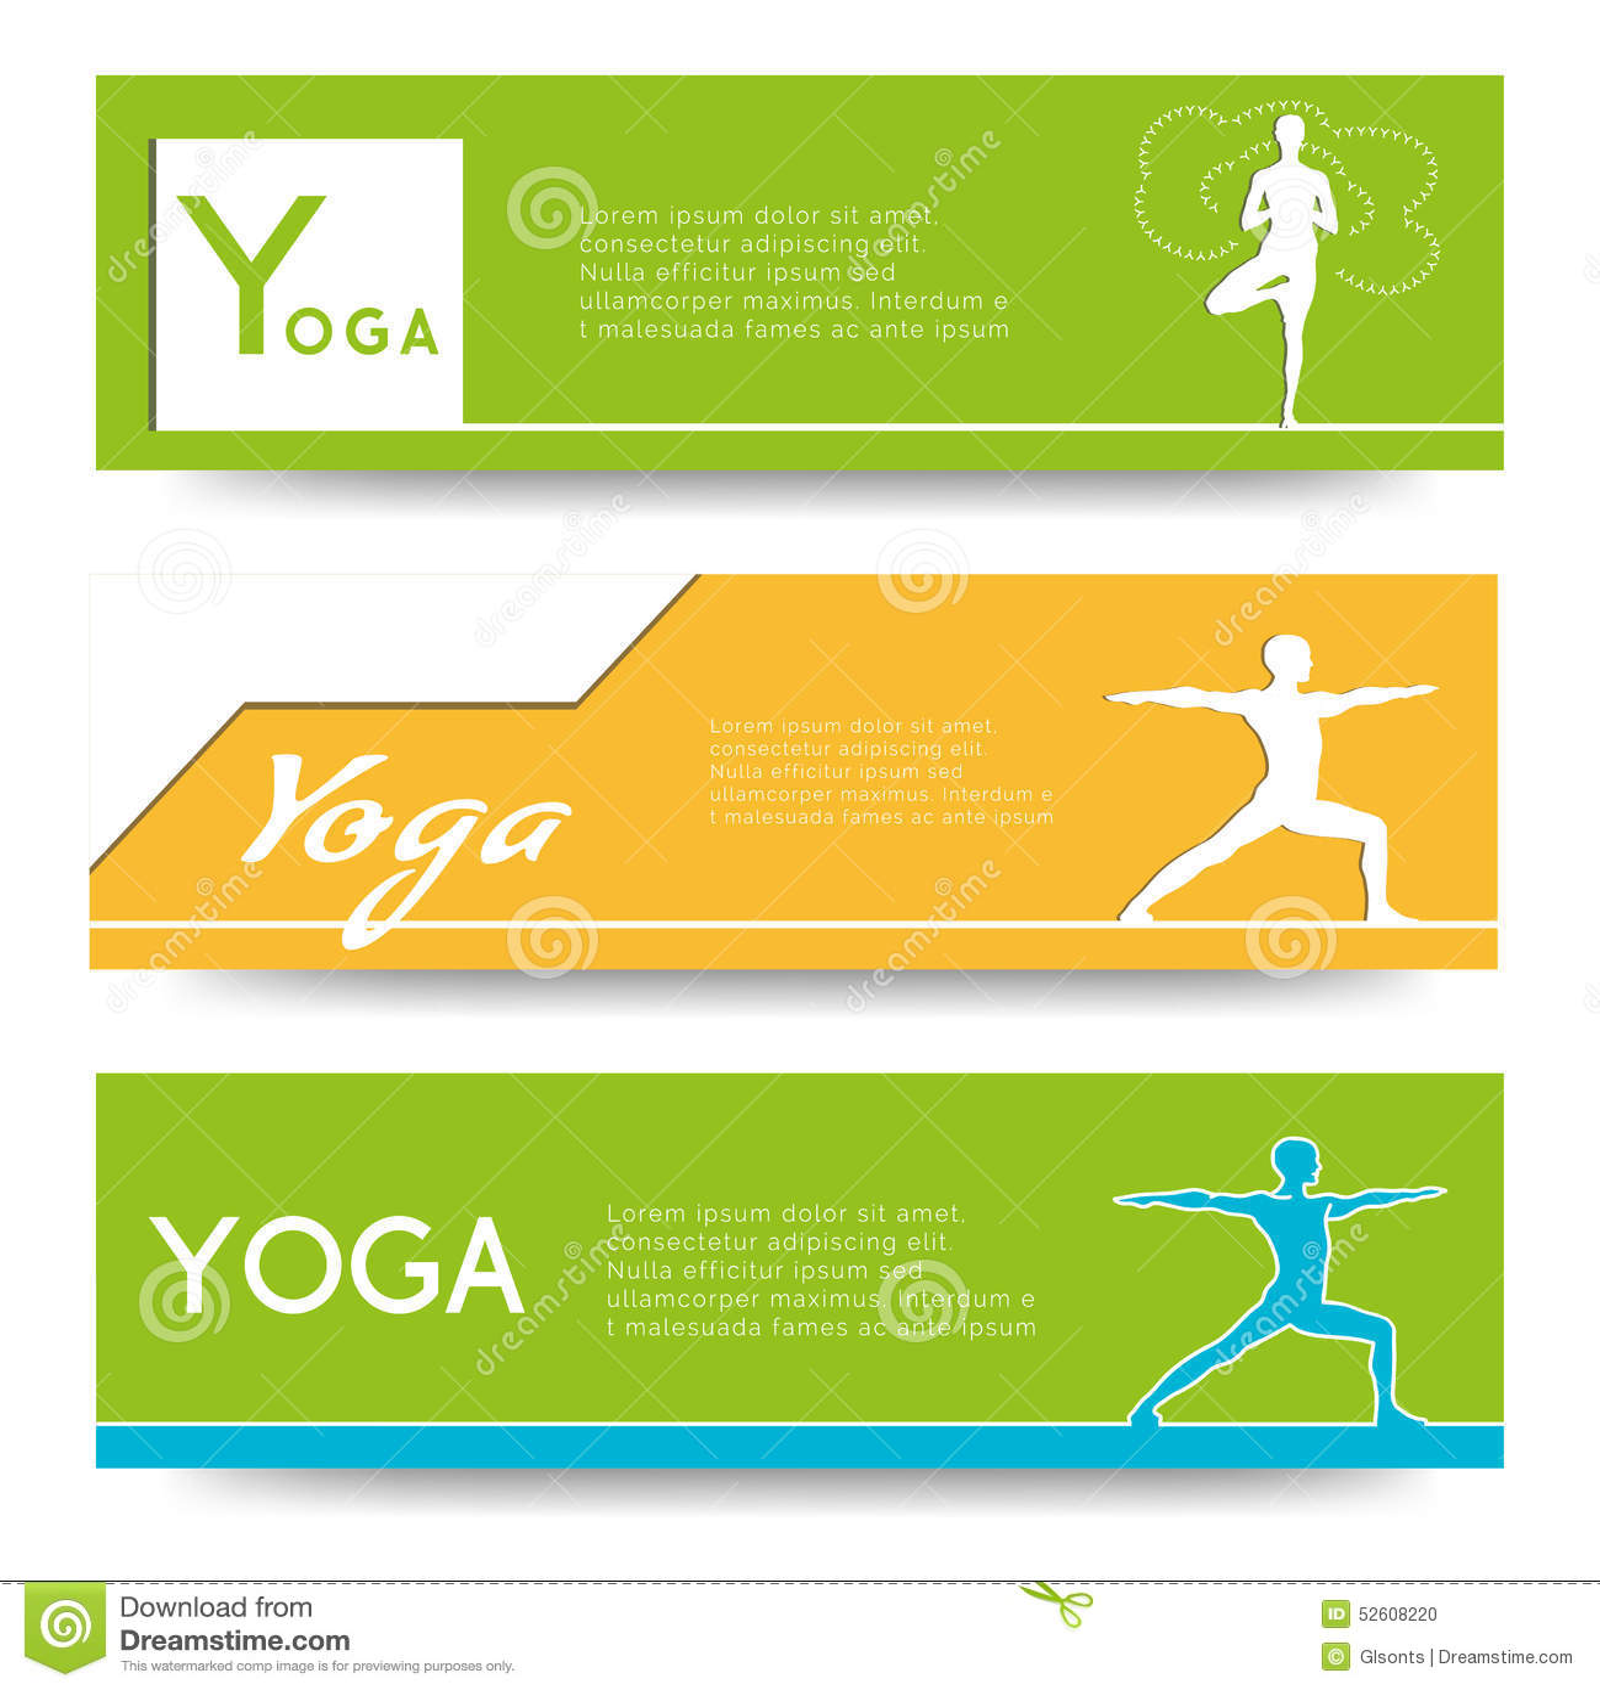 Yoga Vector Banner Professional Templates Or Design For Studio Website Magazine Publishing Print Presentation